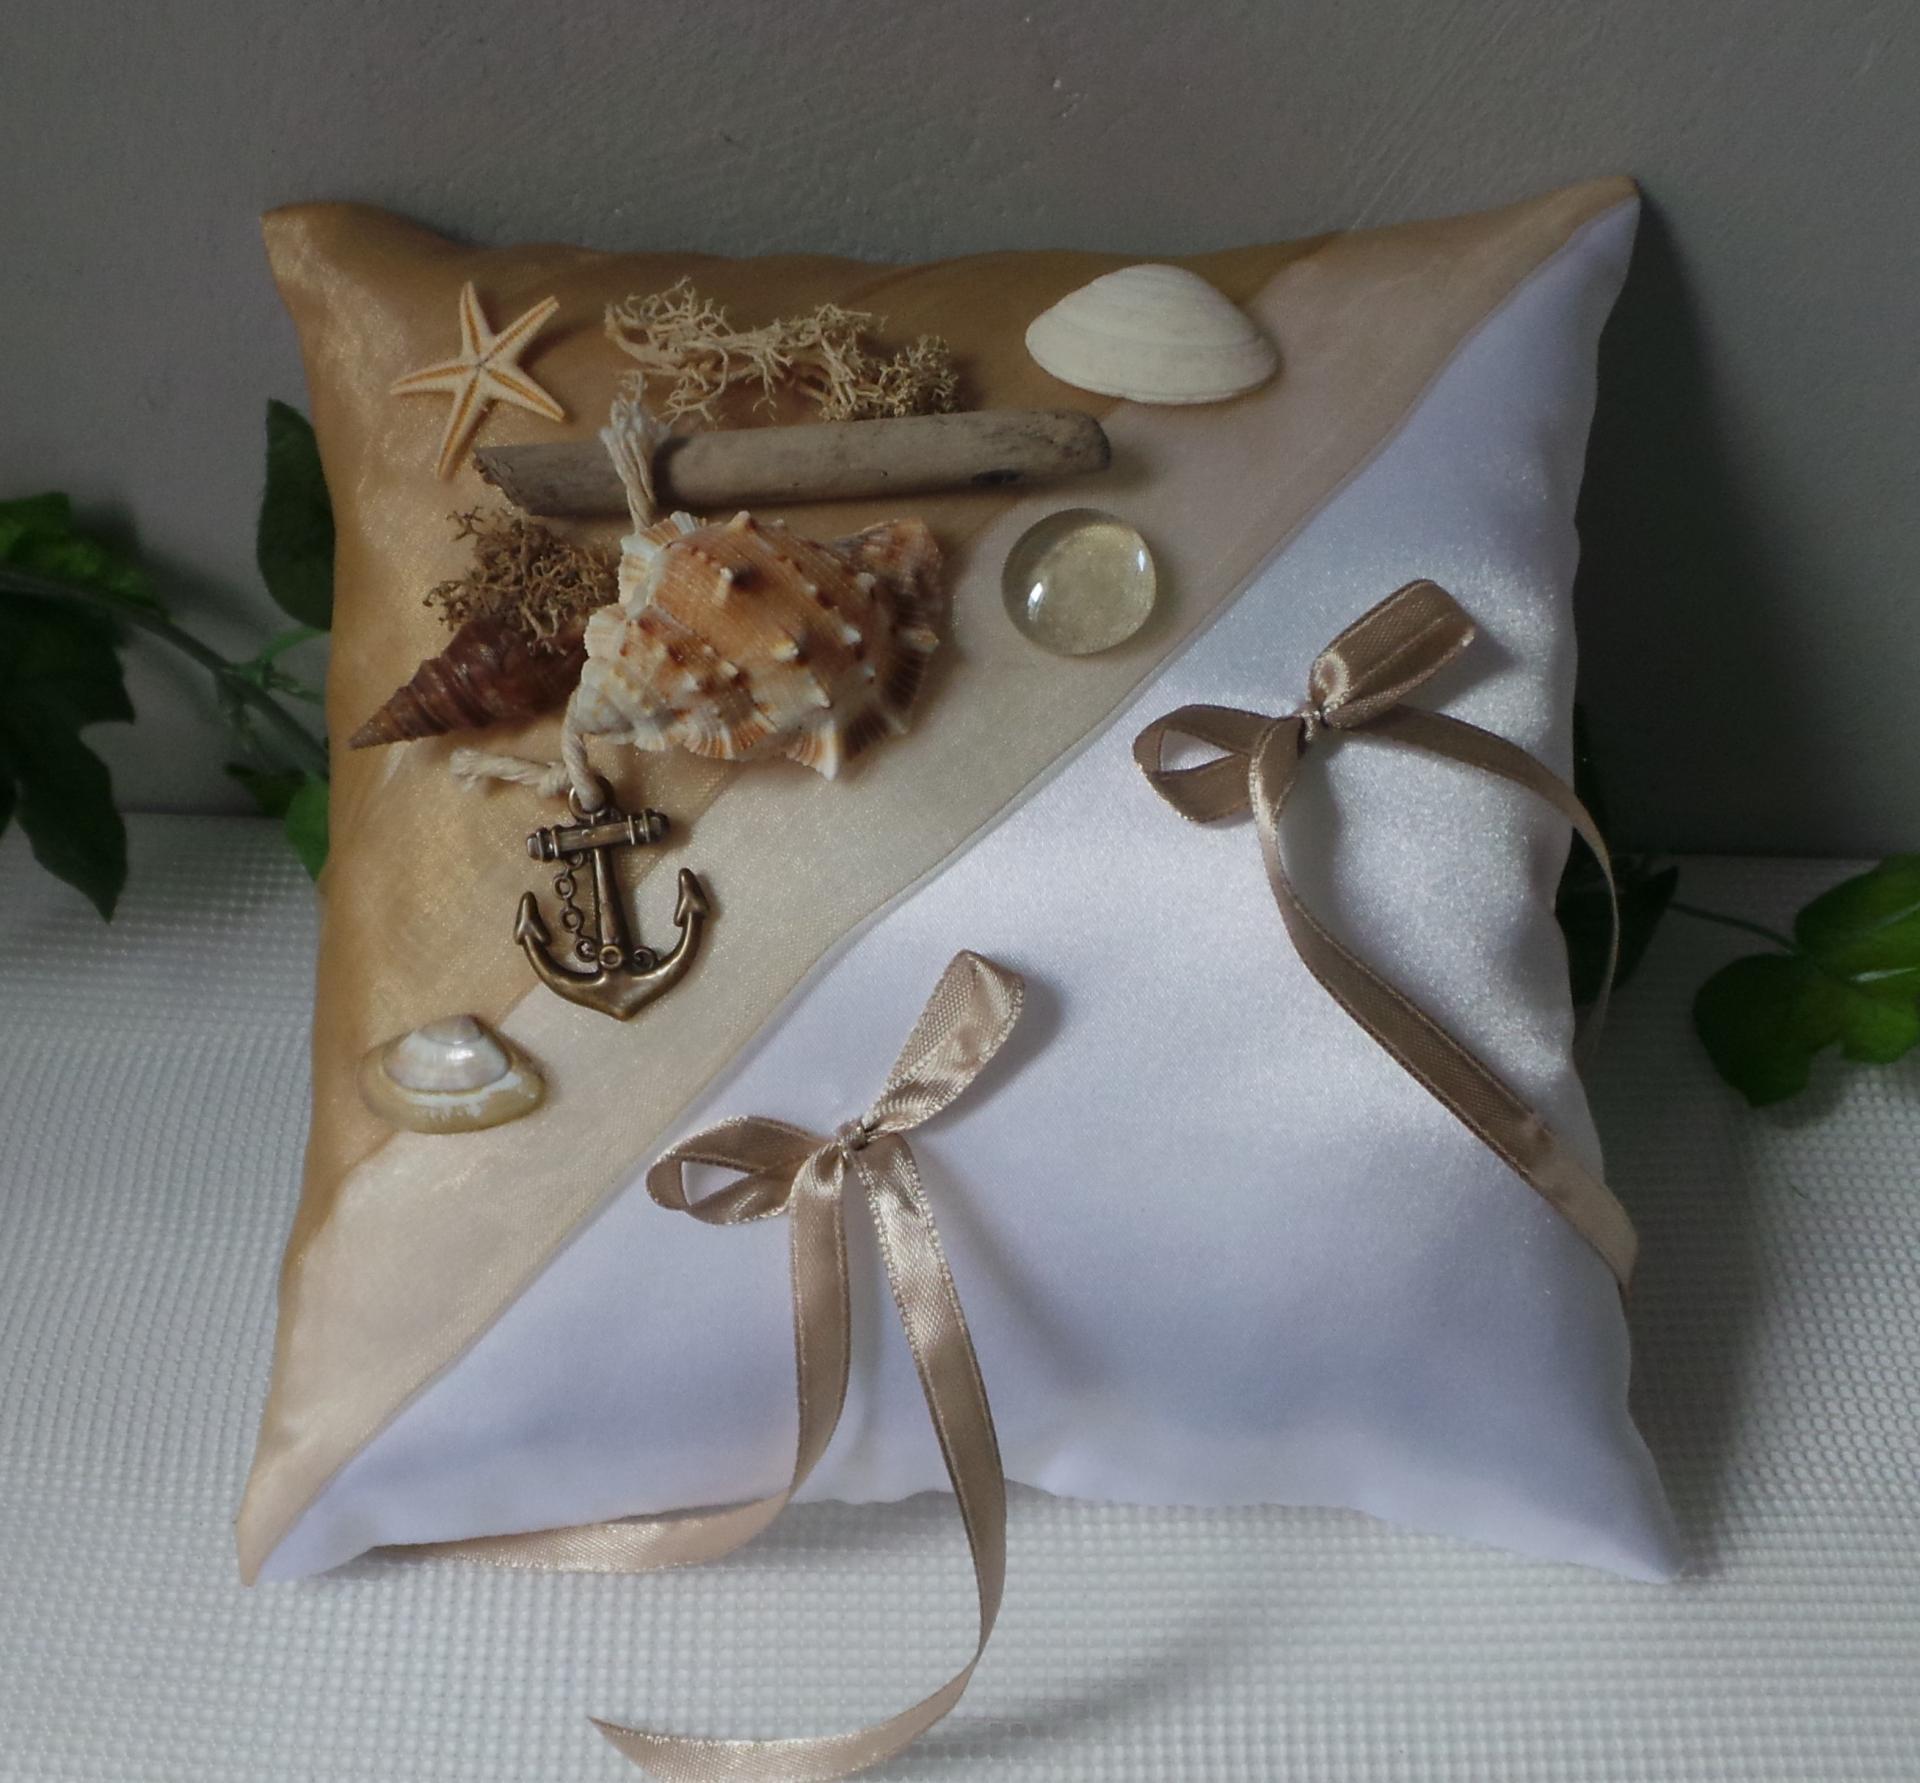 Coussin alliance mariage ivoire chocolat id es et d for Idee deco kingersheim